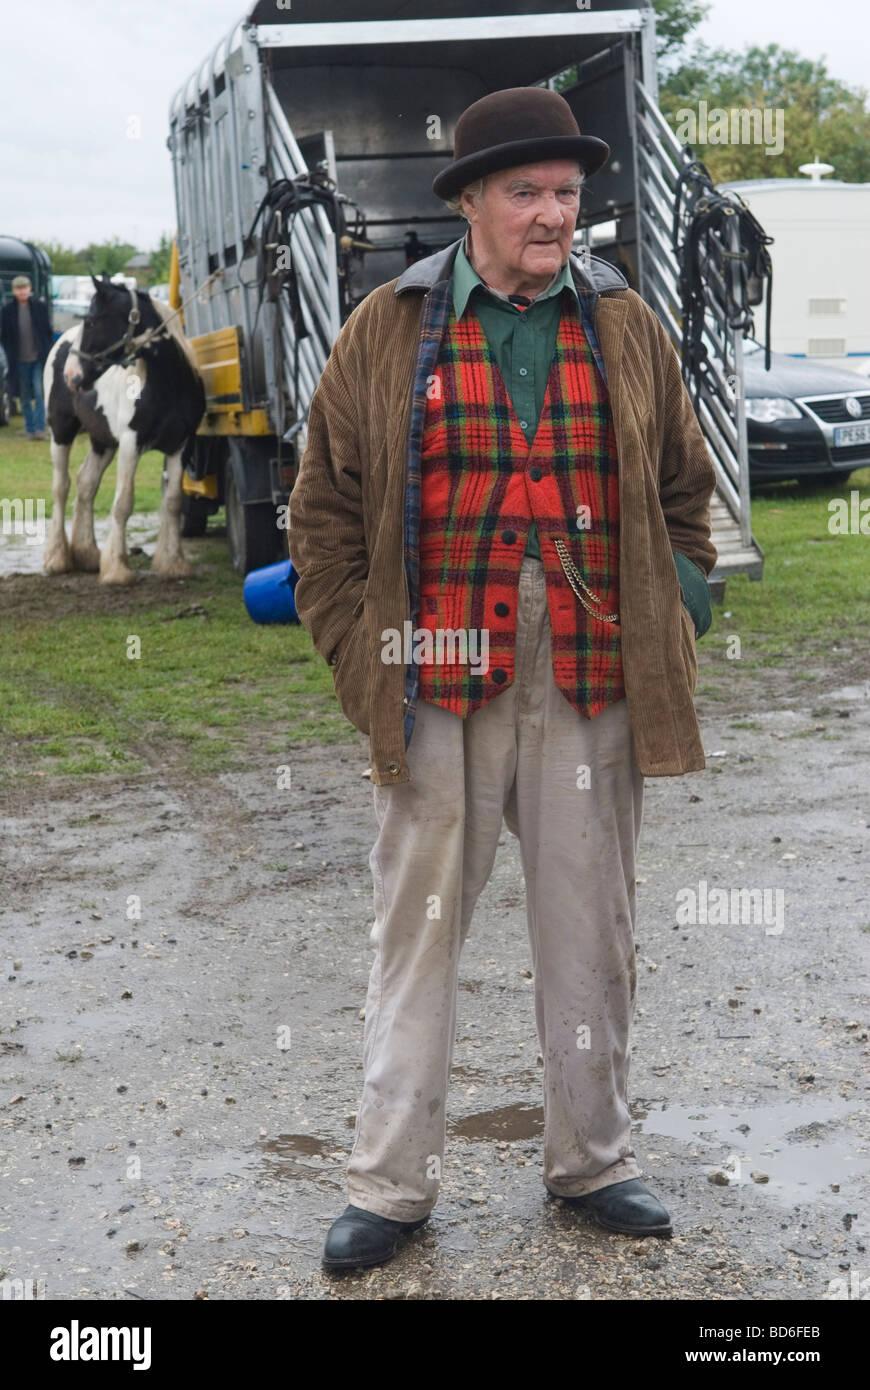 bfc8f4b468c85 Brigg Horse Fair Brigg Lincolnshire England Brown Derby bowler hat and  tartan waistcoat HOMER SYKES